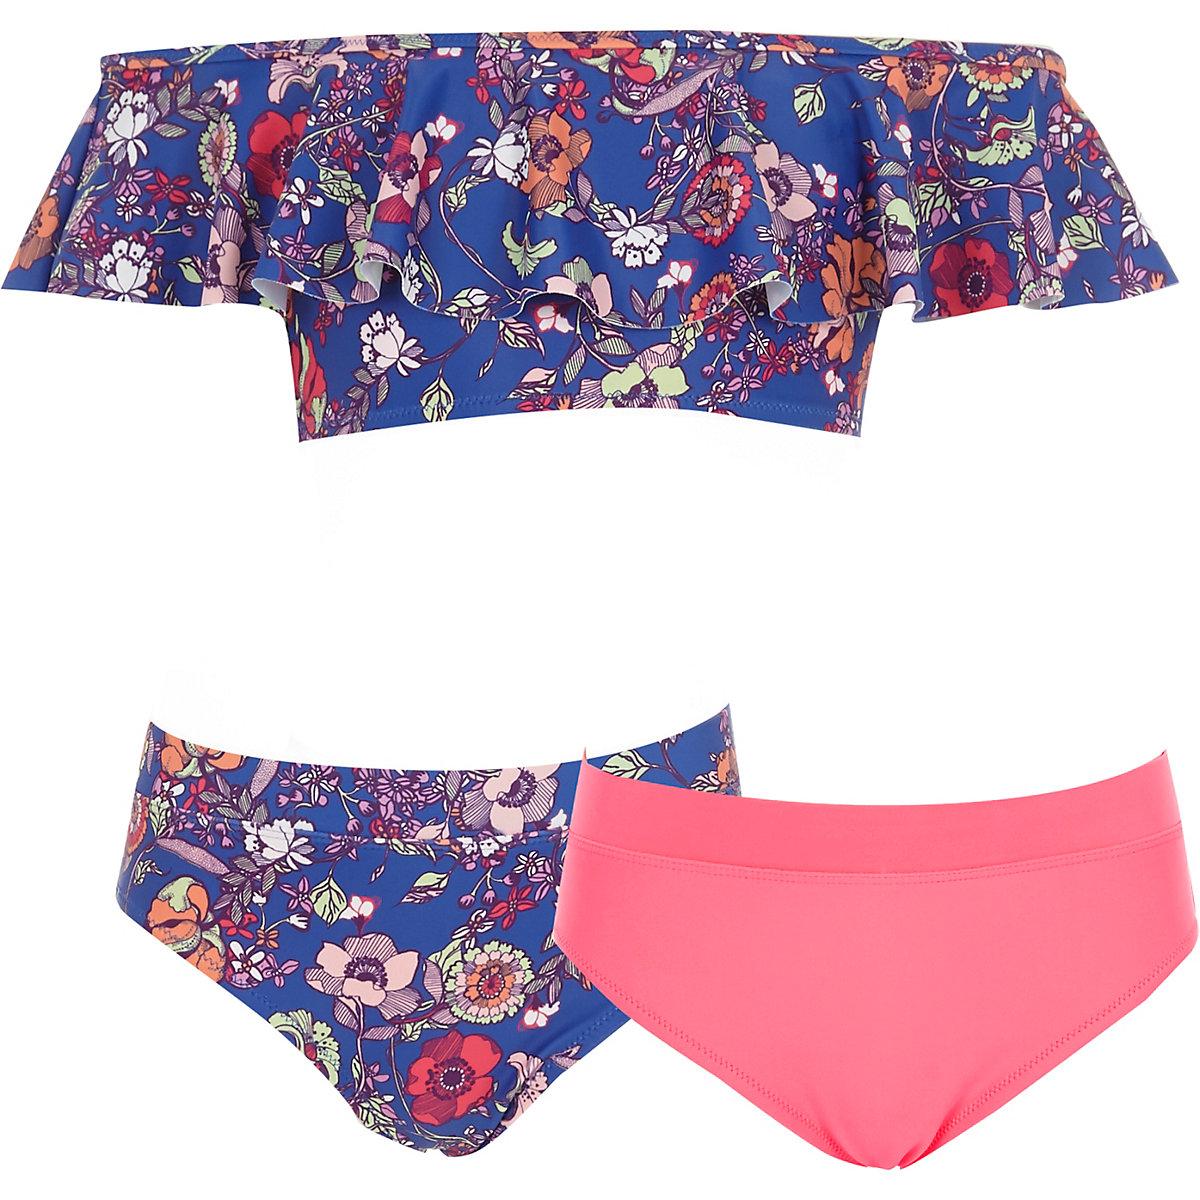 Girls blue floral three piece bikini set